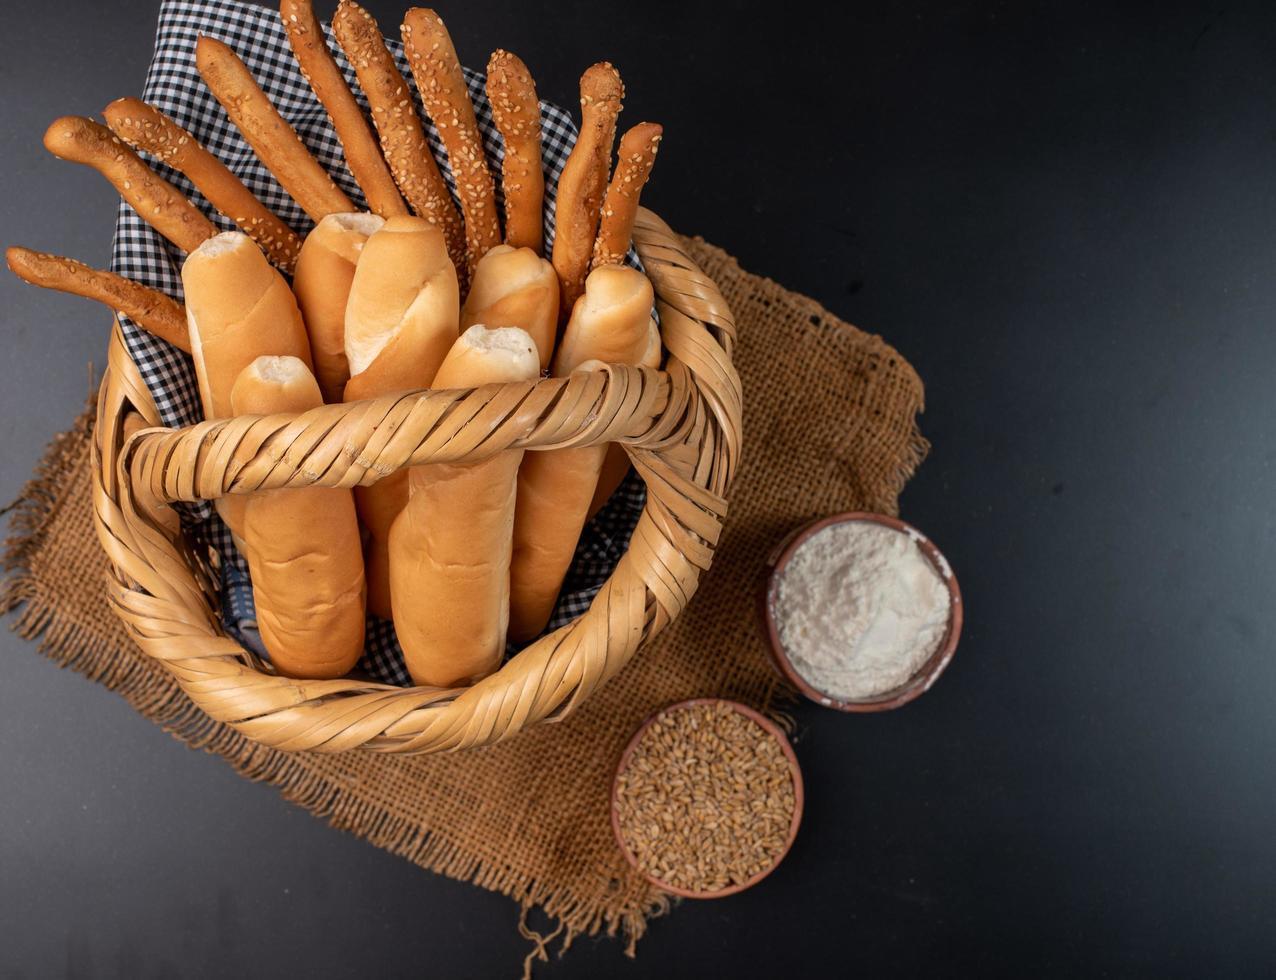 Brot in einem Korb foto